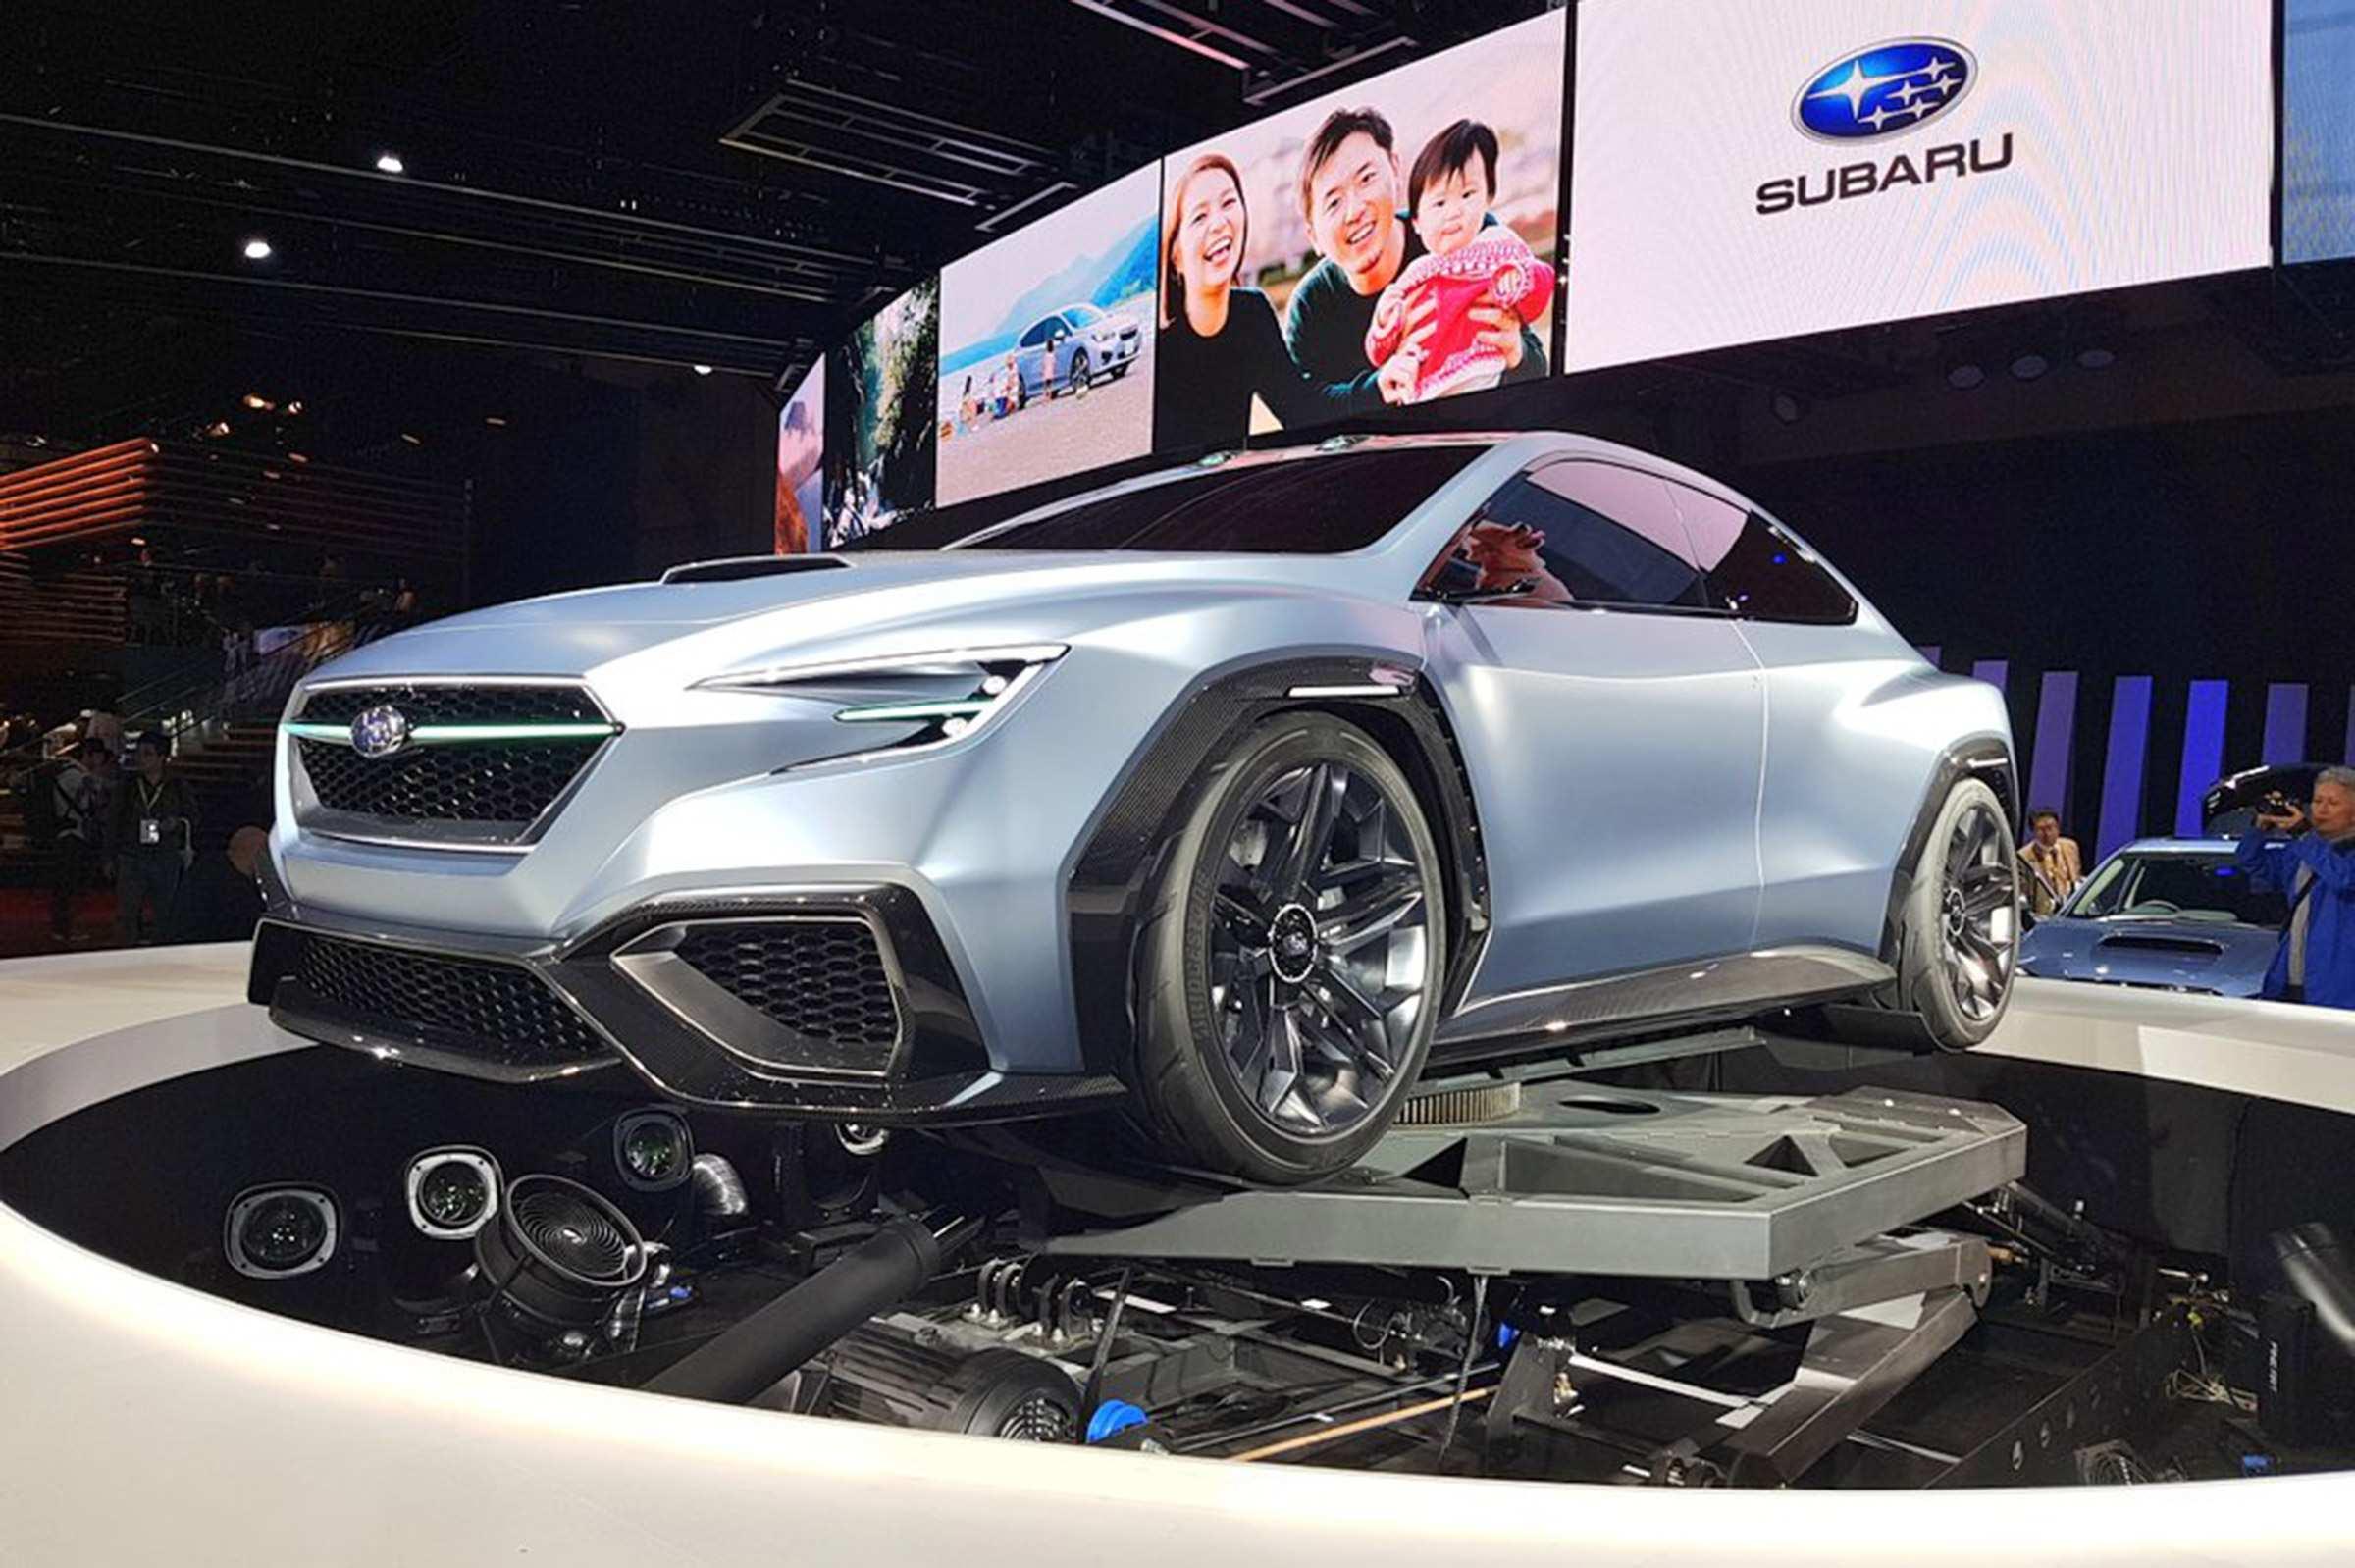 74 All New 2020 Subaru Impreza Wrx Sti First Drive for 2020 Subaru Impreza Wrx Sti